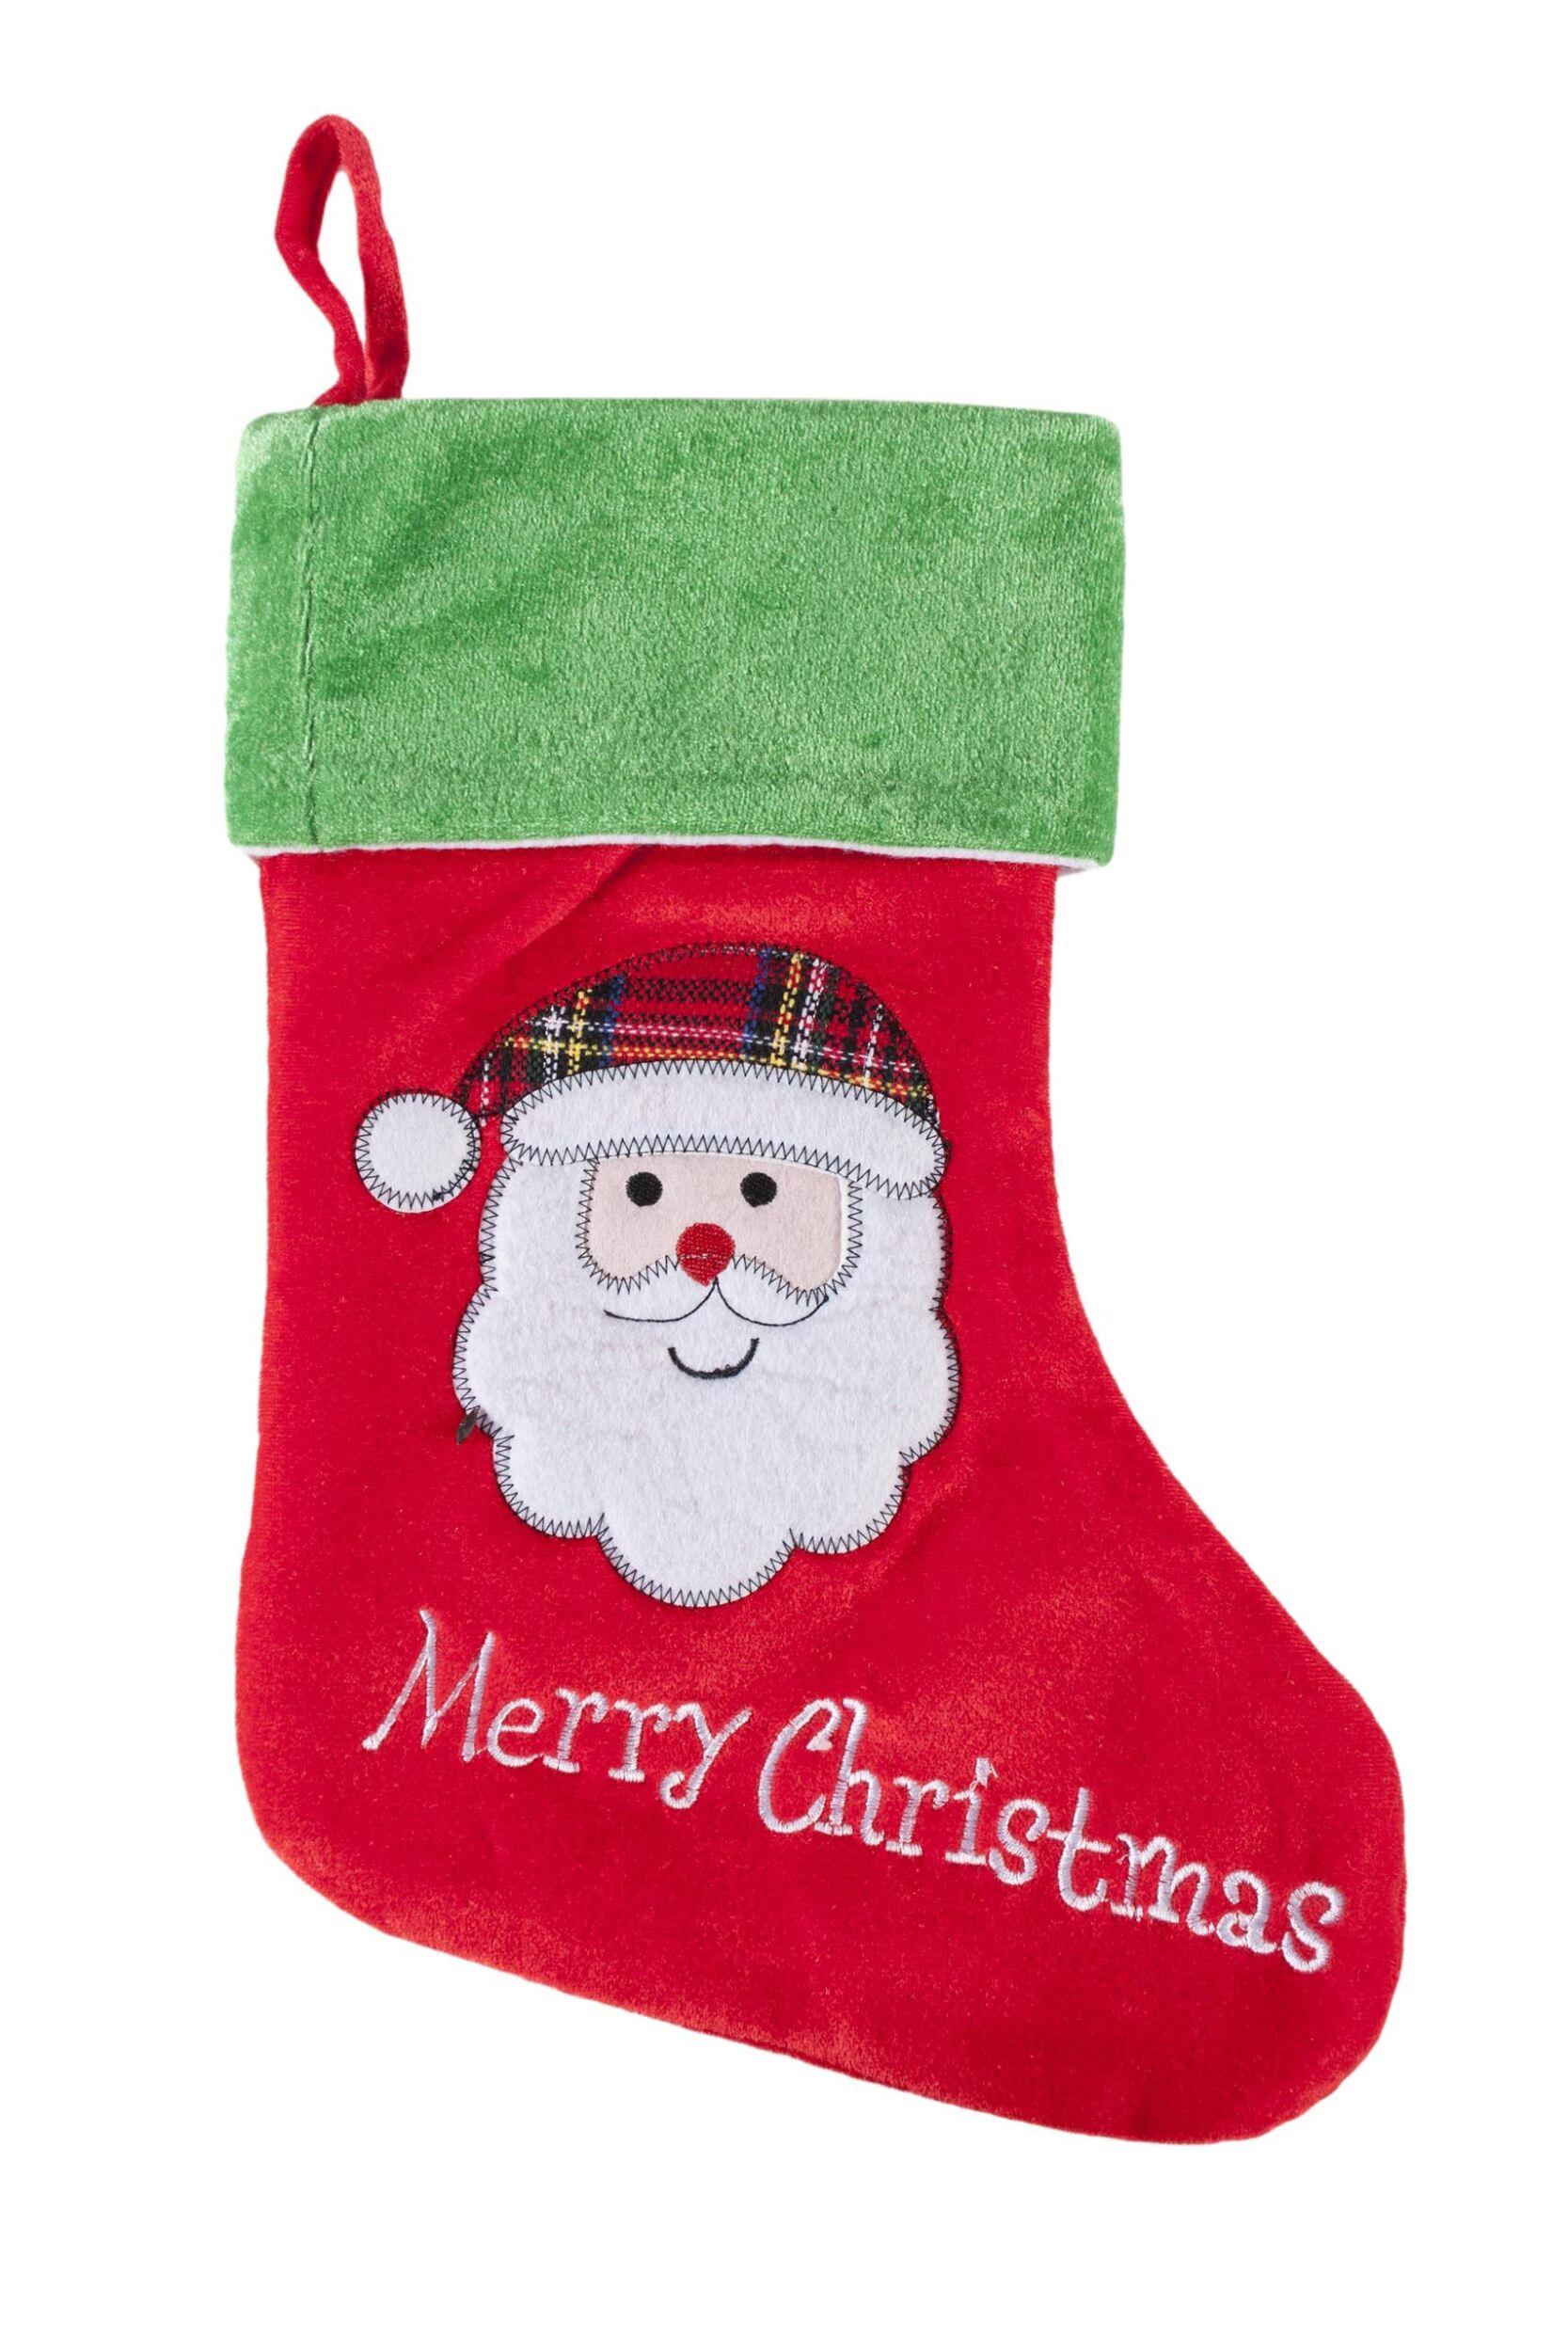 SockShop Santa Merry Christmas Christmas Stocking